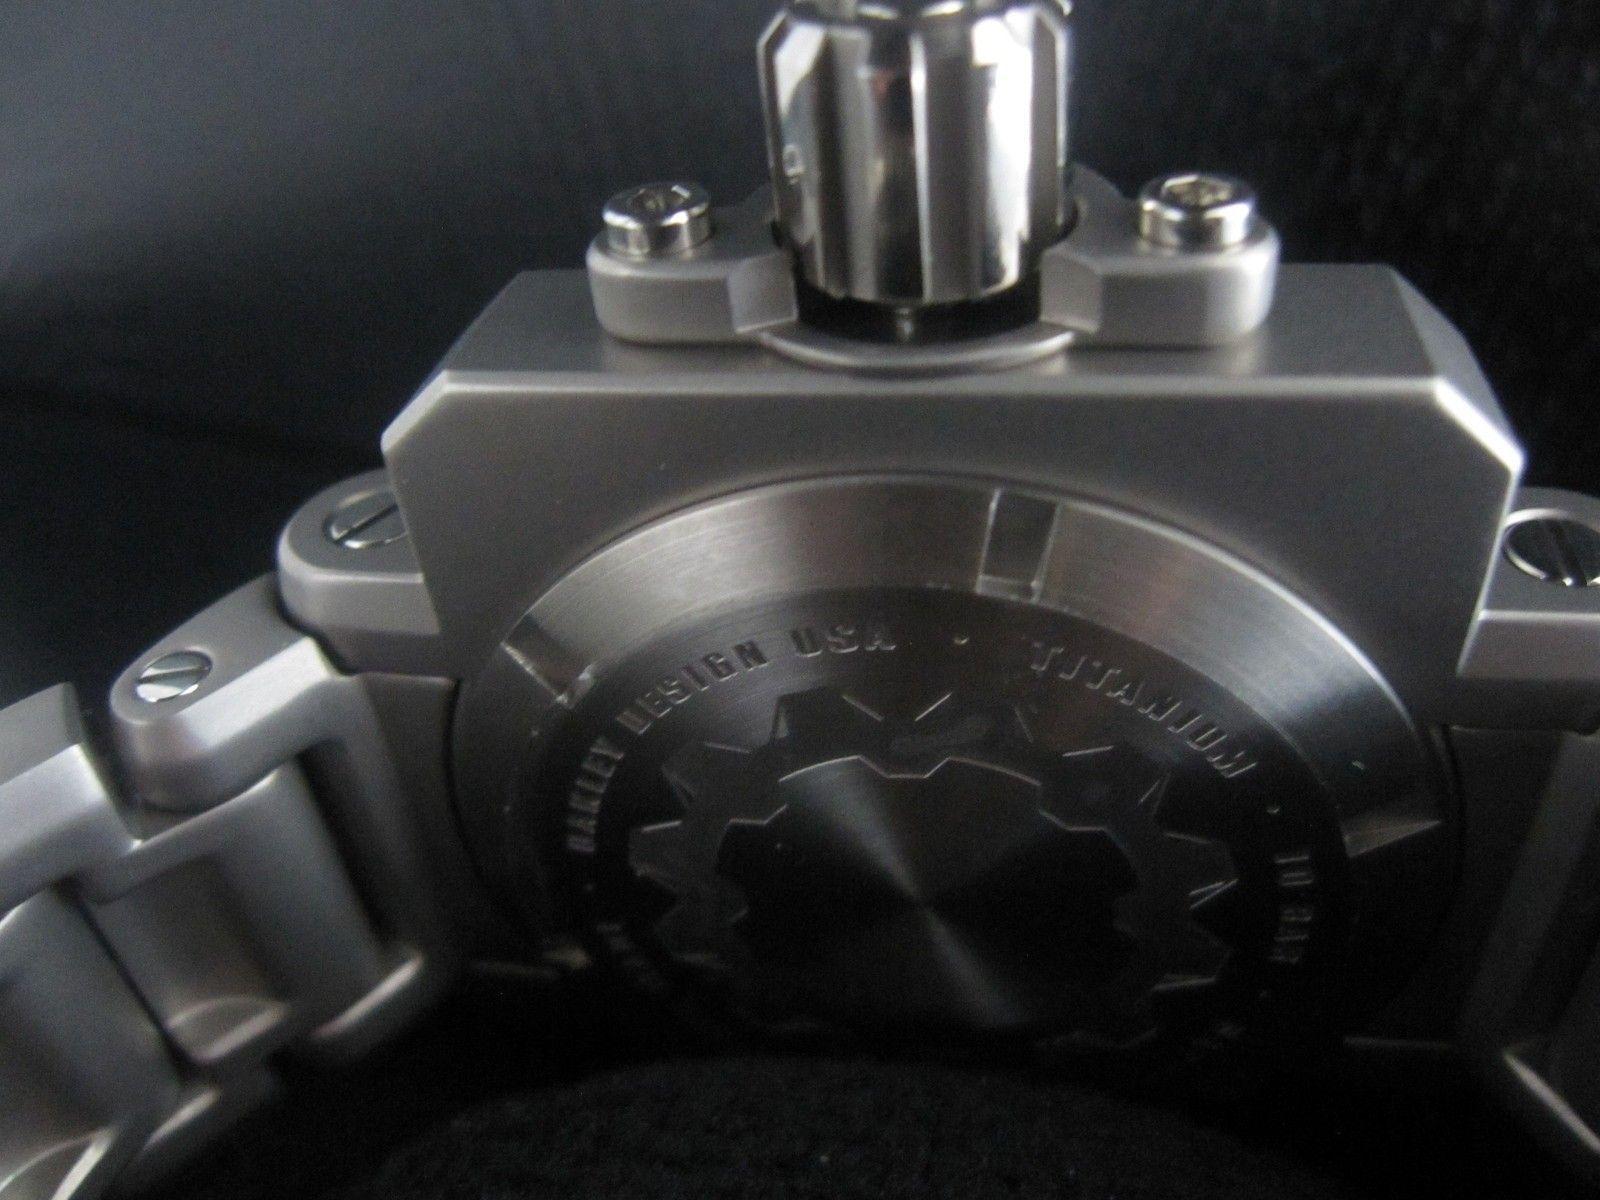 BNIB Gearbox Titanium Bracelet Watch - OW0004-01 - IMG_2065.JPG